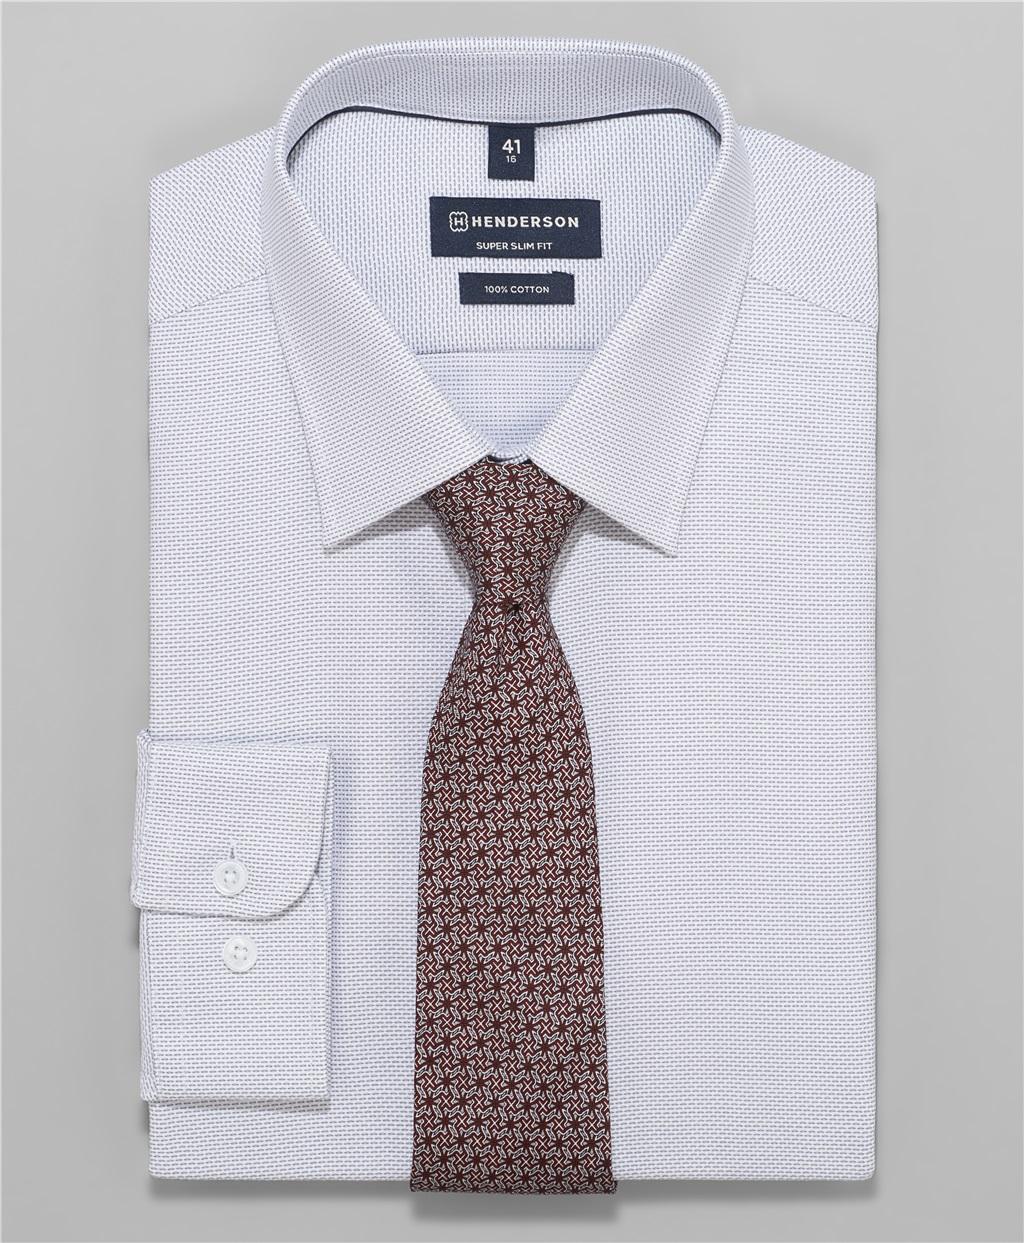 Рубашка прилегающий силуэт HENDERSON SHL-1394 GREY фото